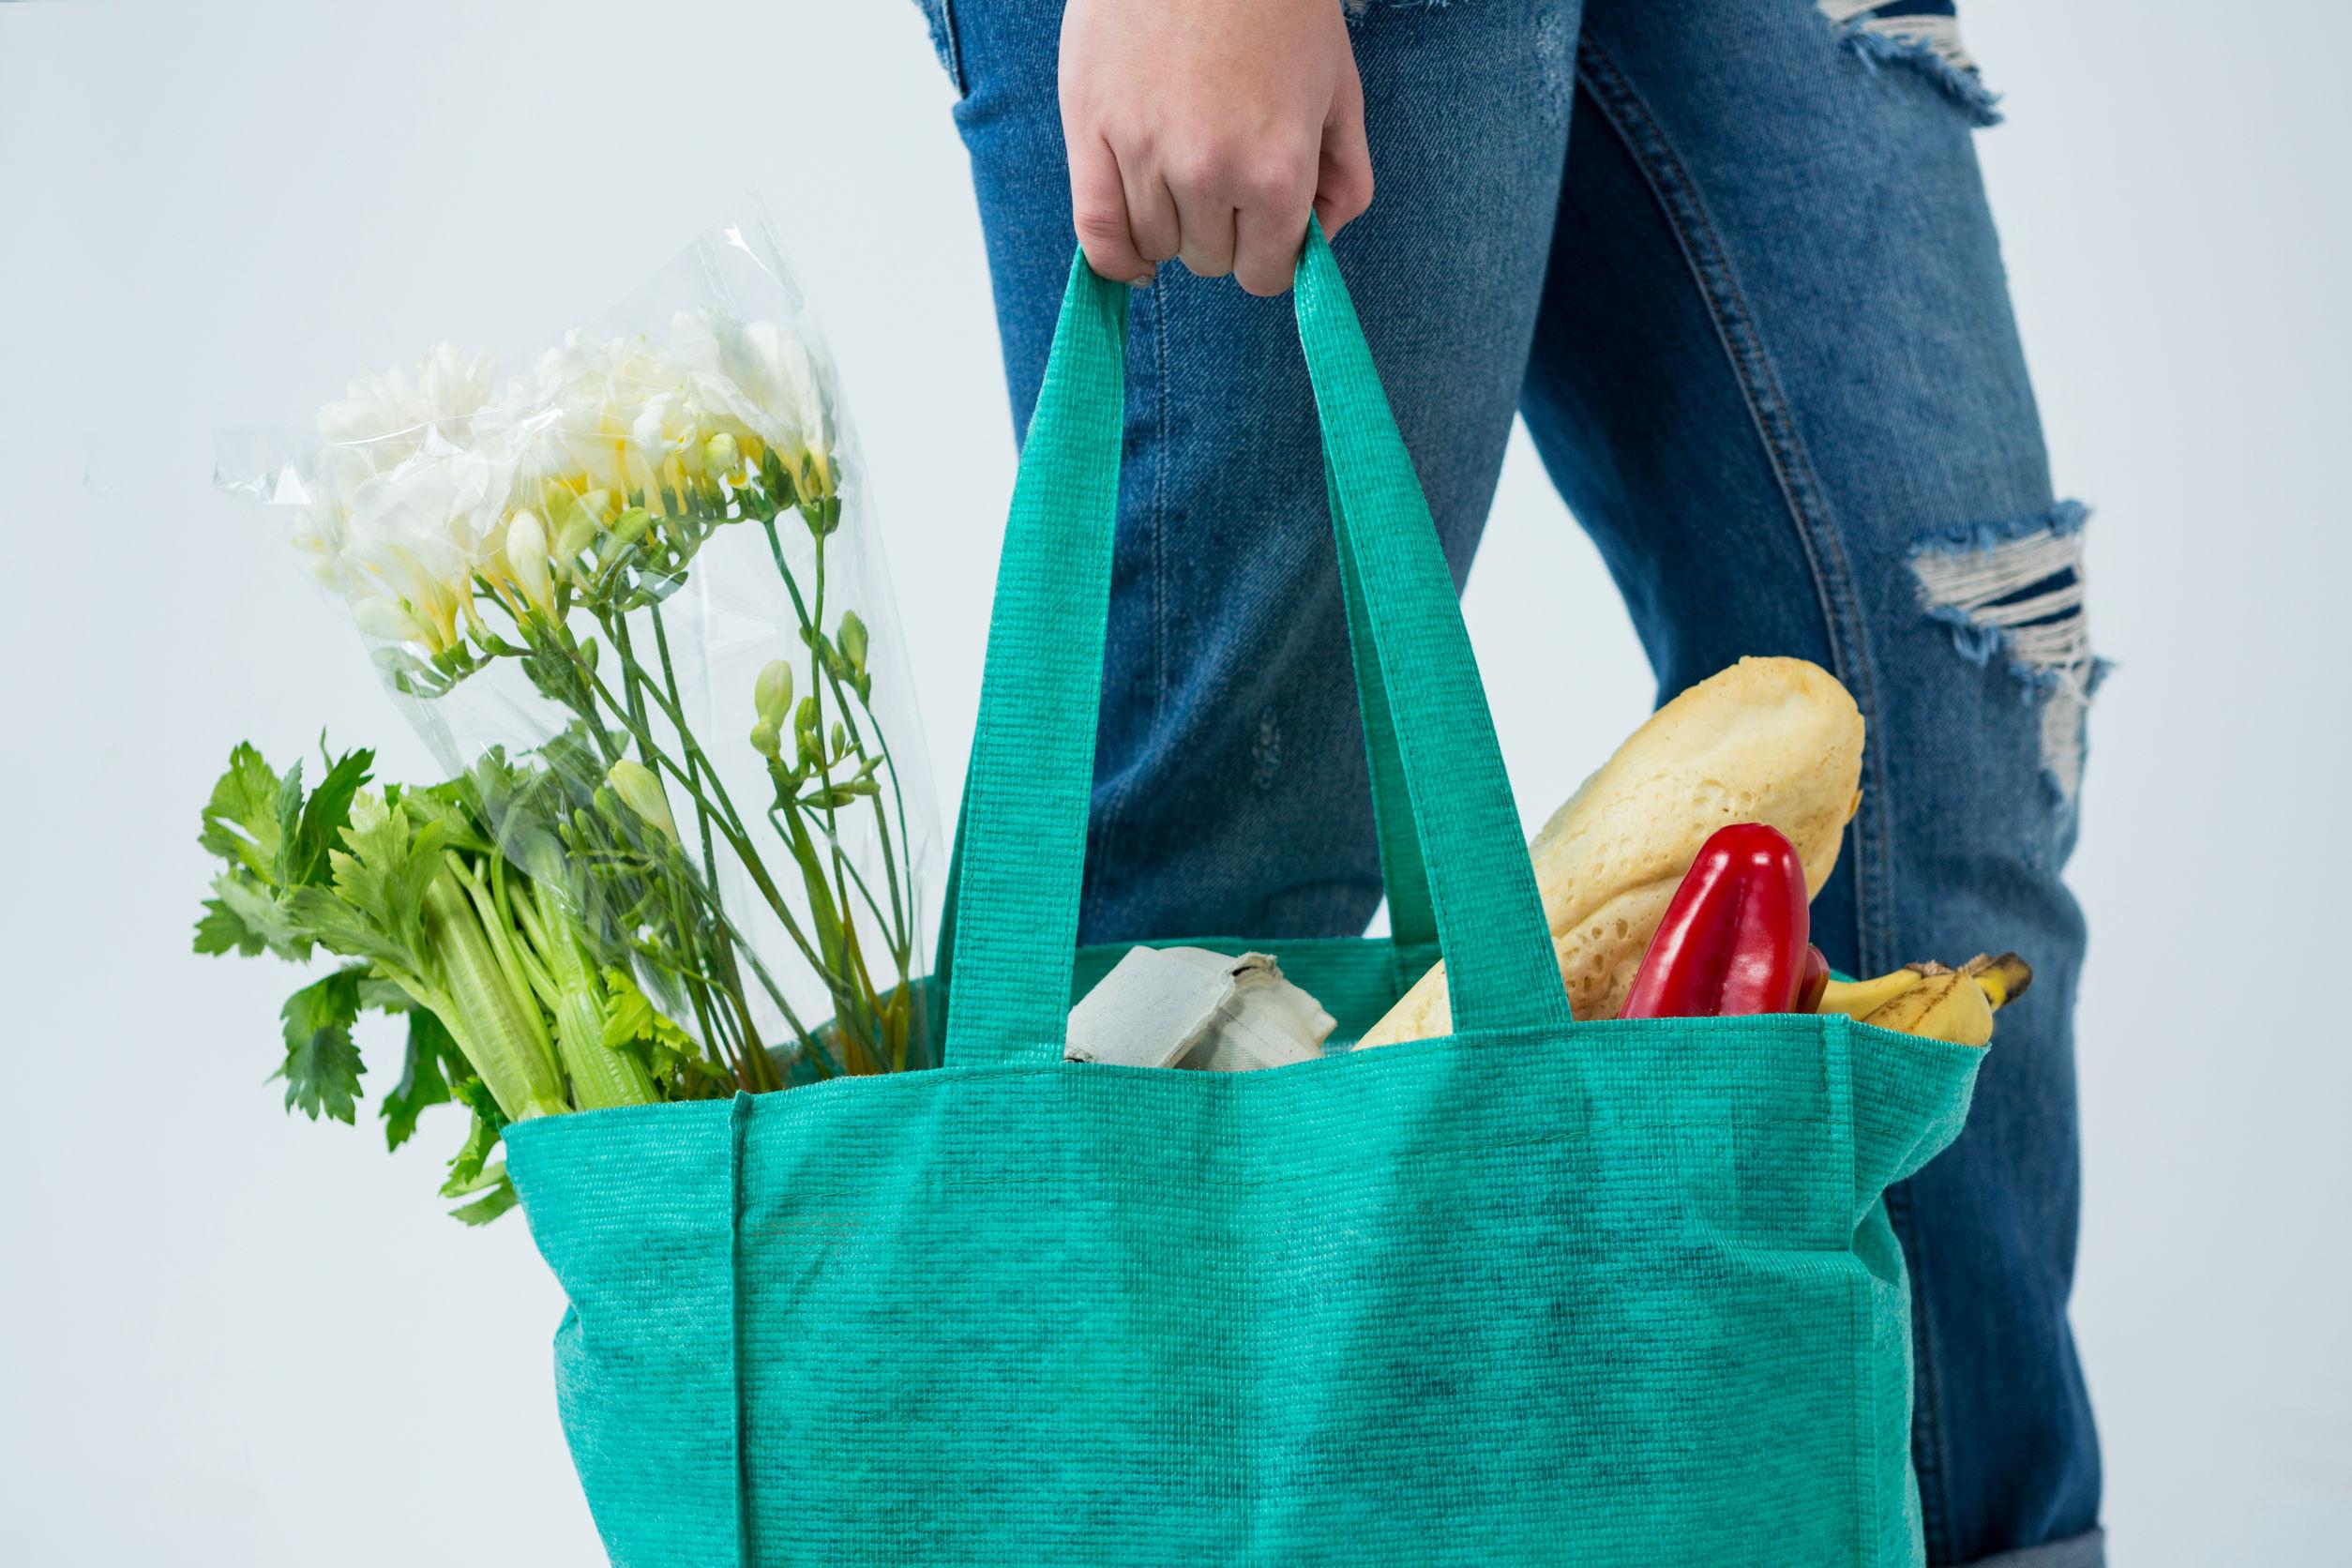 carregando sacola de compras